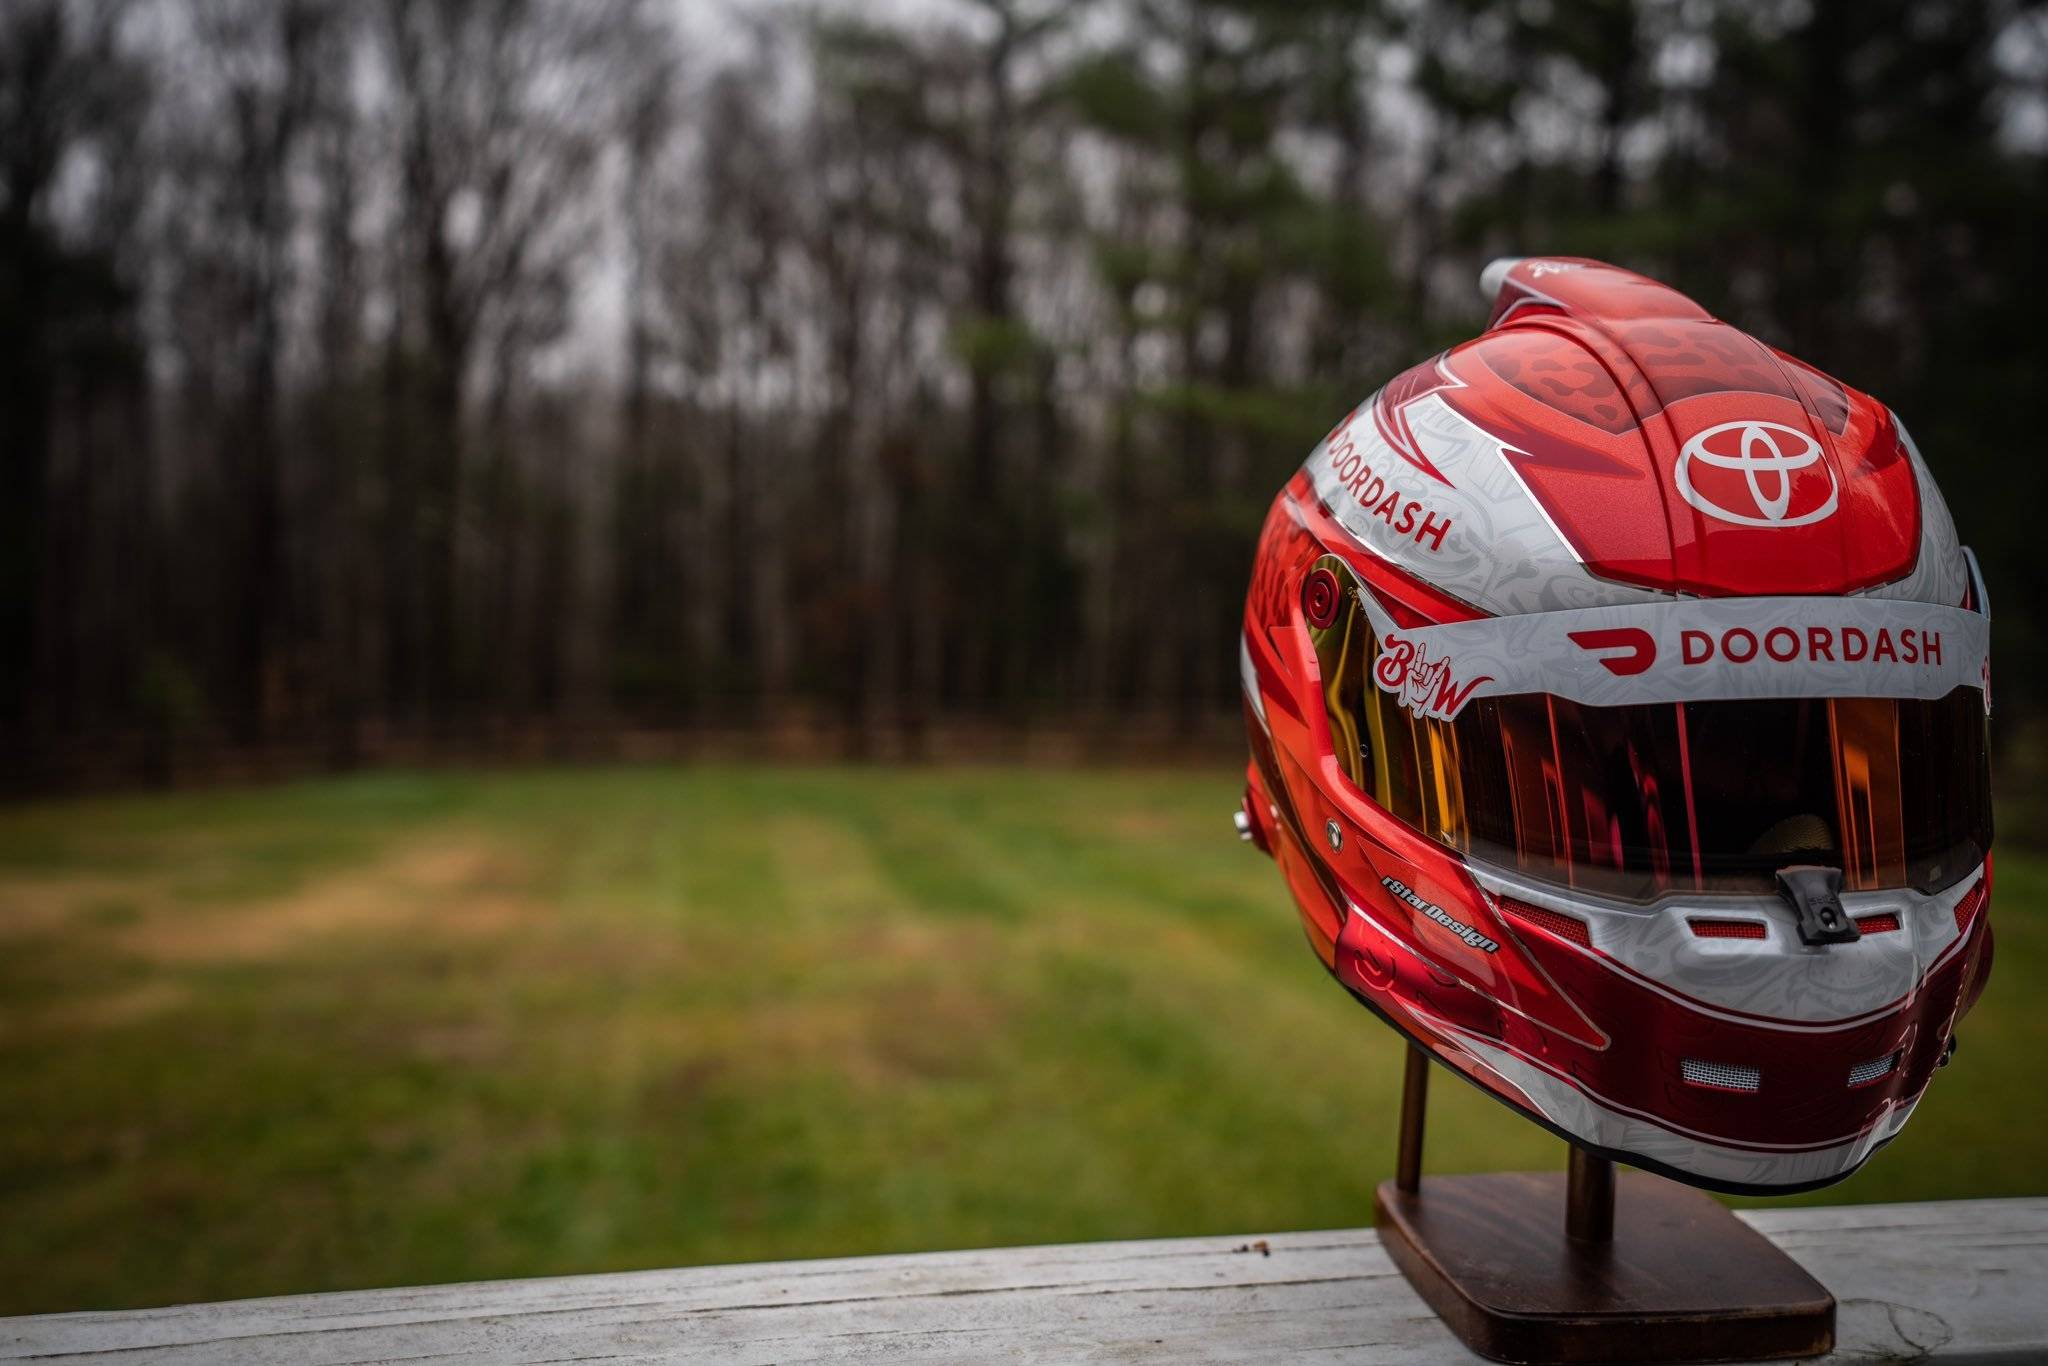 Bubba Wallace - Doordash helmet